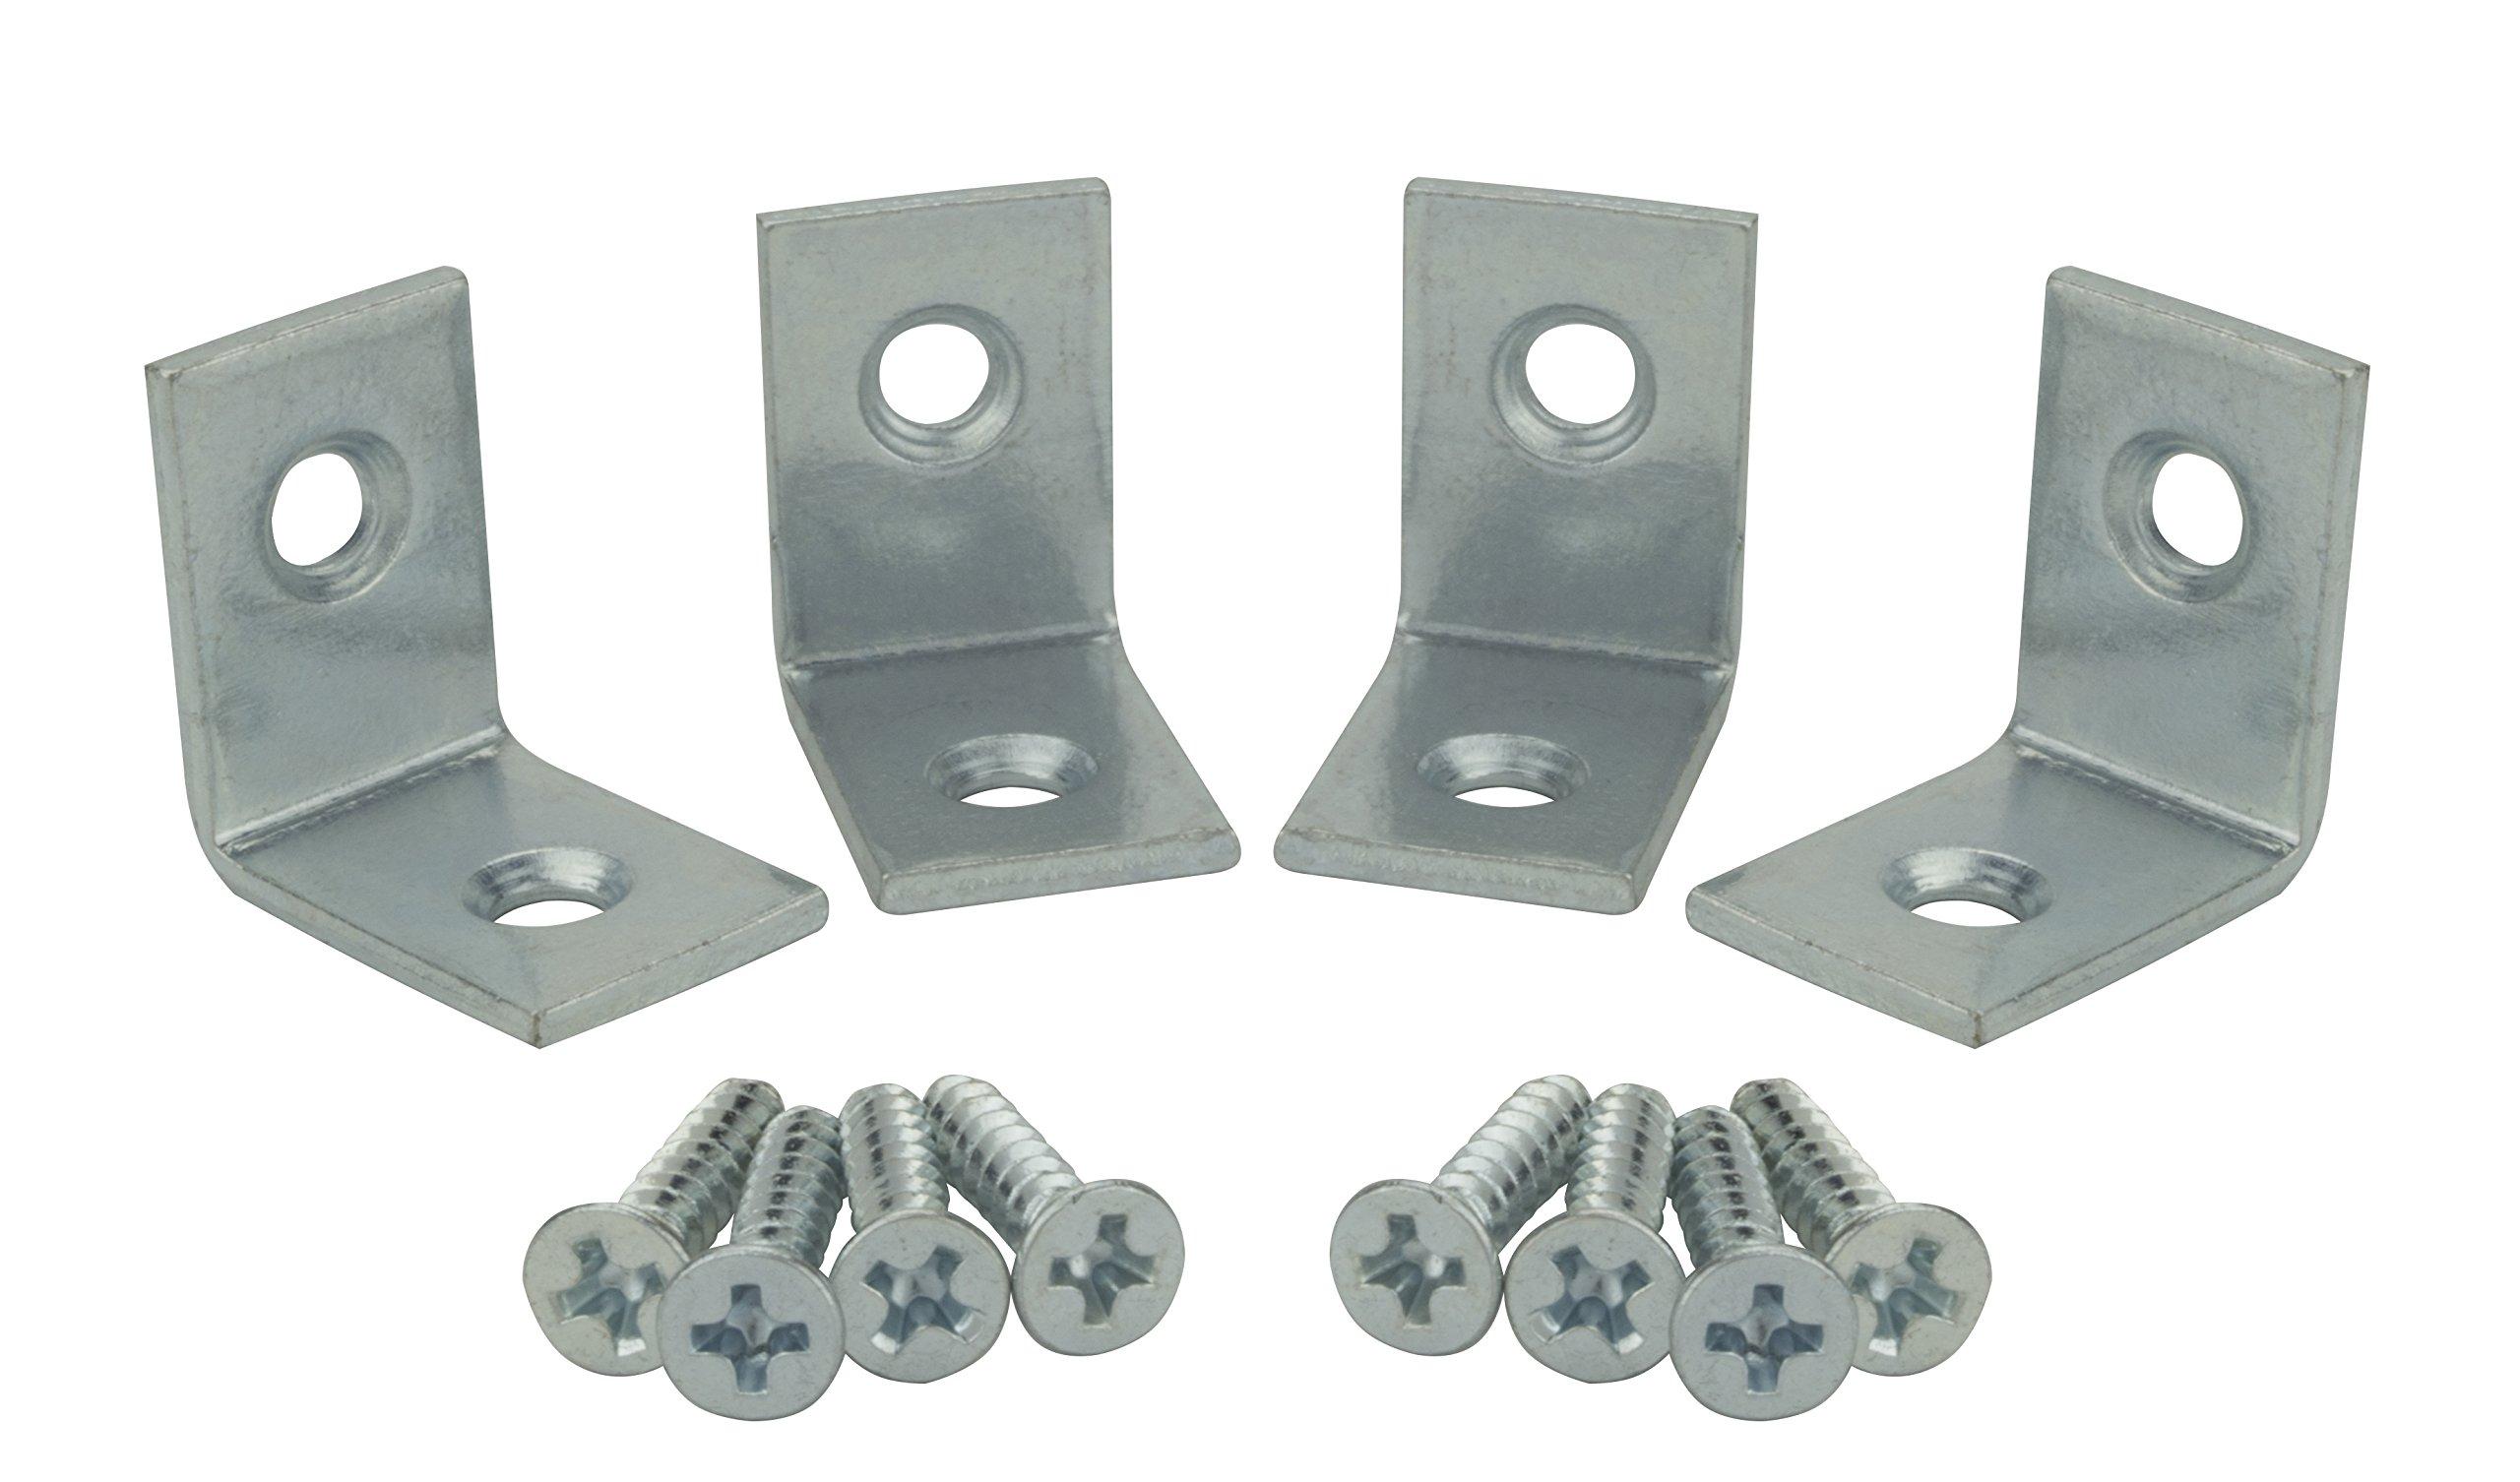 Specialty Hardware Corner Brace3/4 inch Zinc Plated 400pcs